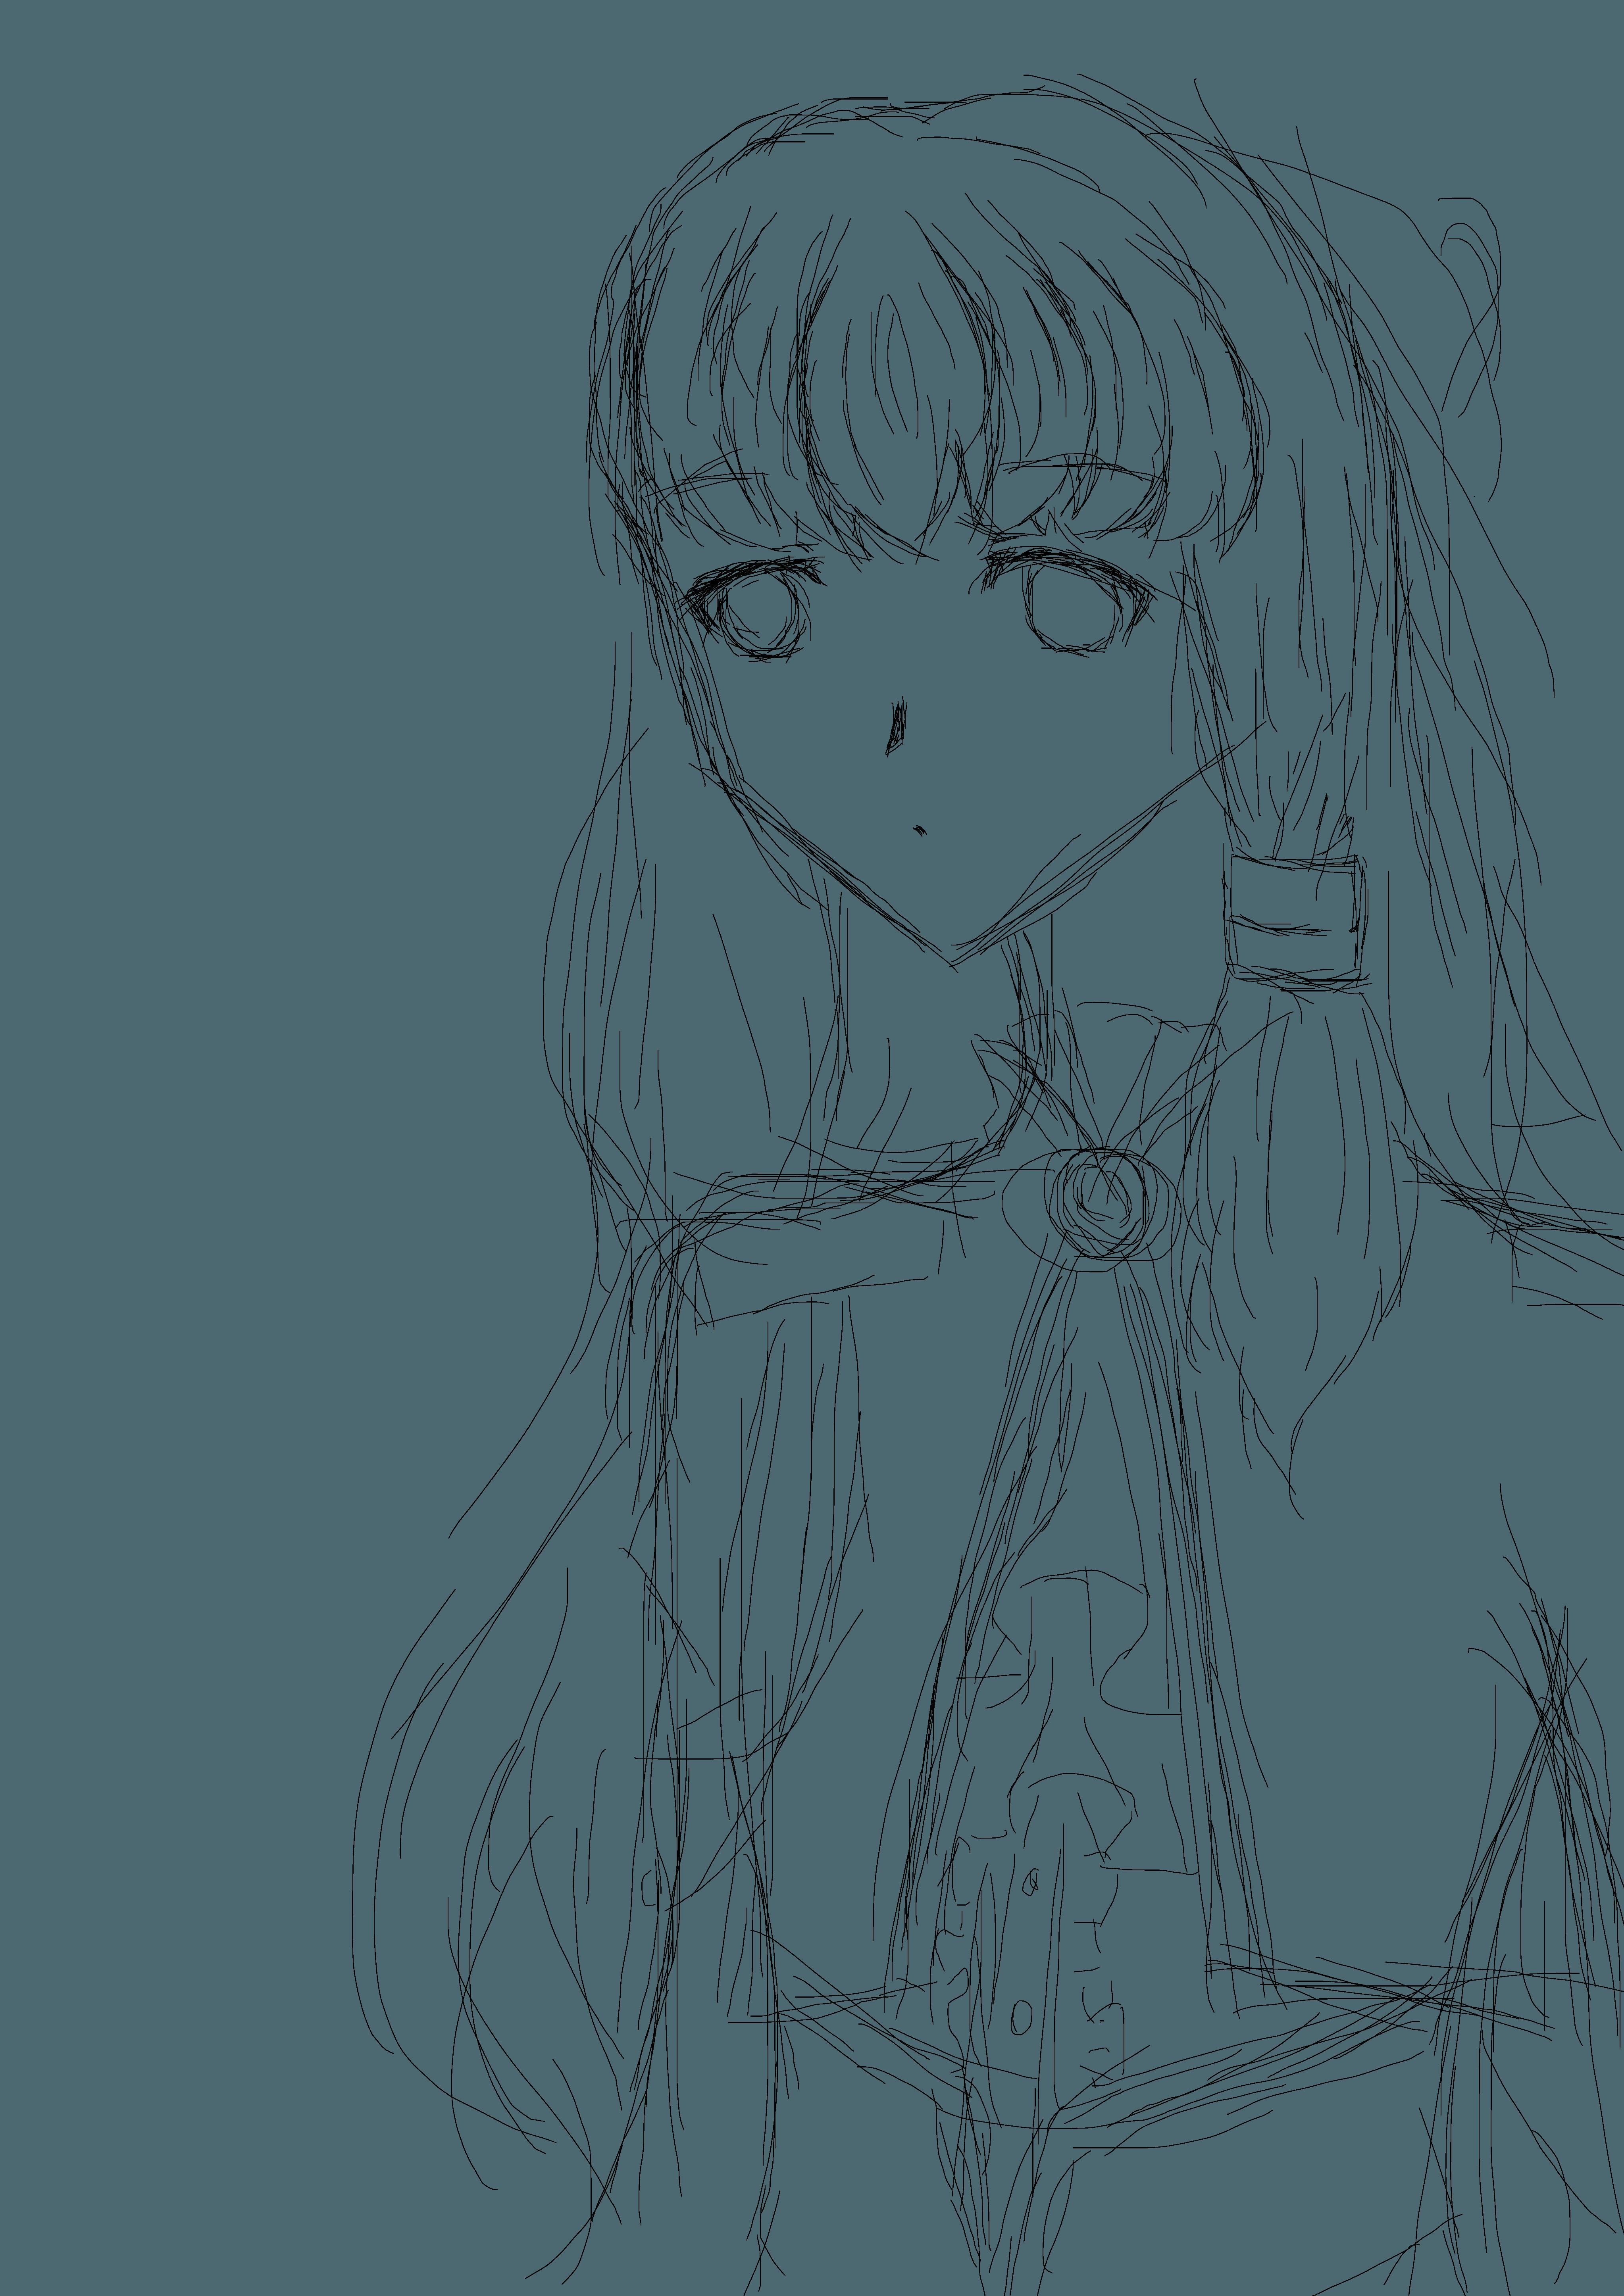 Sketch Yuki Yuna Illustrations Art Street